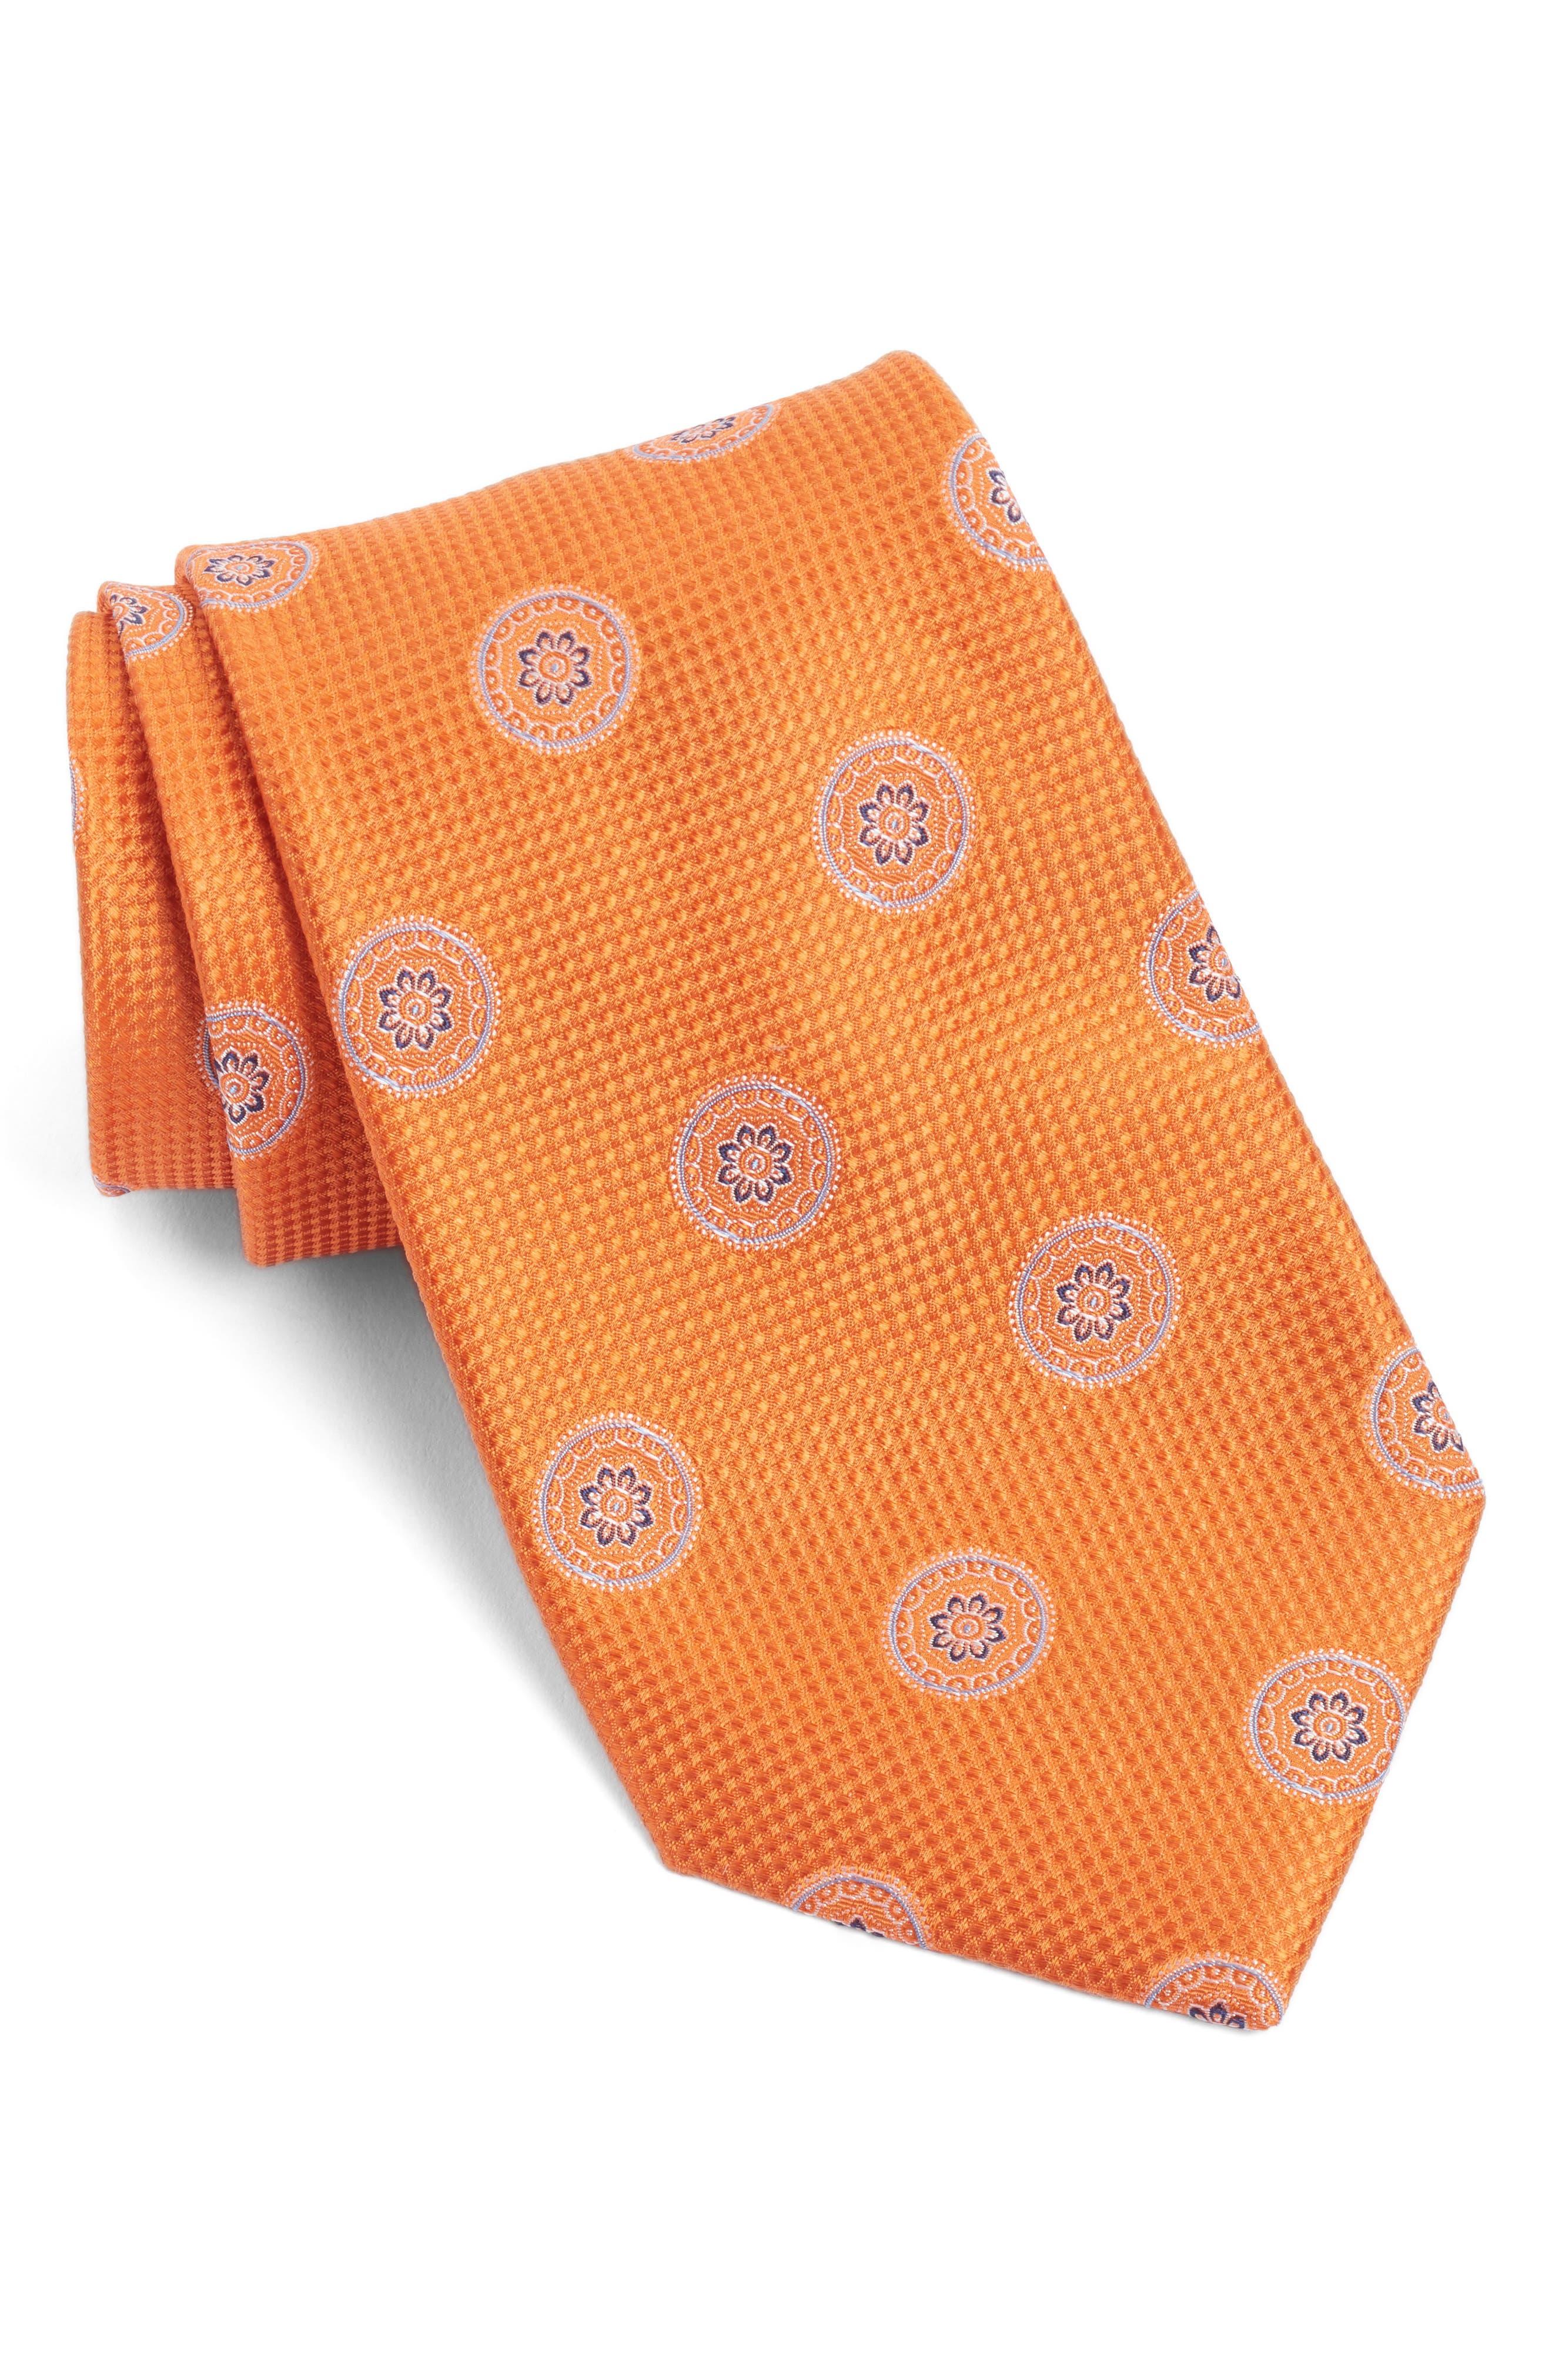 Nordstrom Men's Shop Circular Medallion Silk Tie